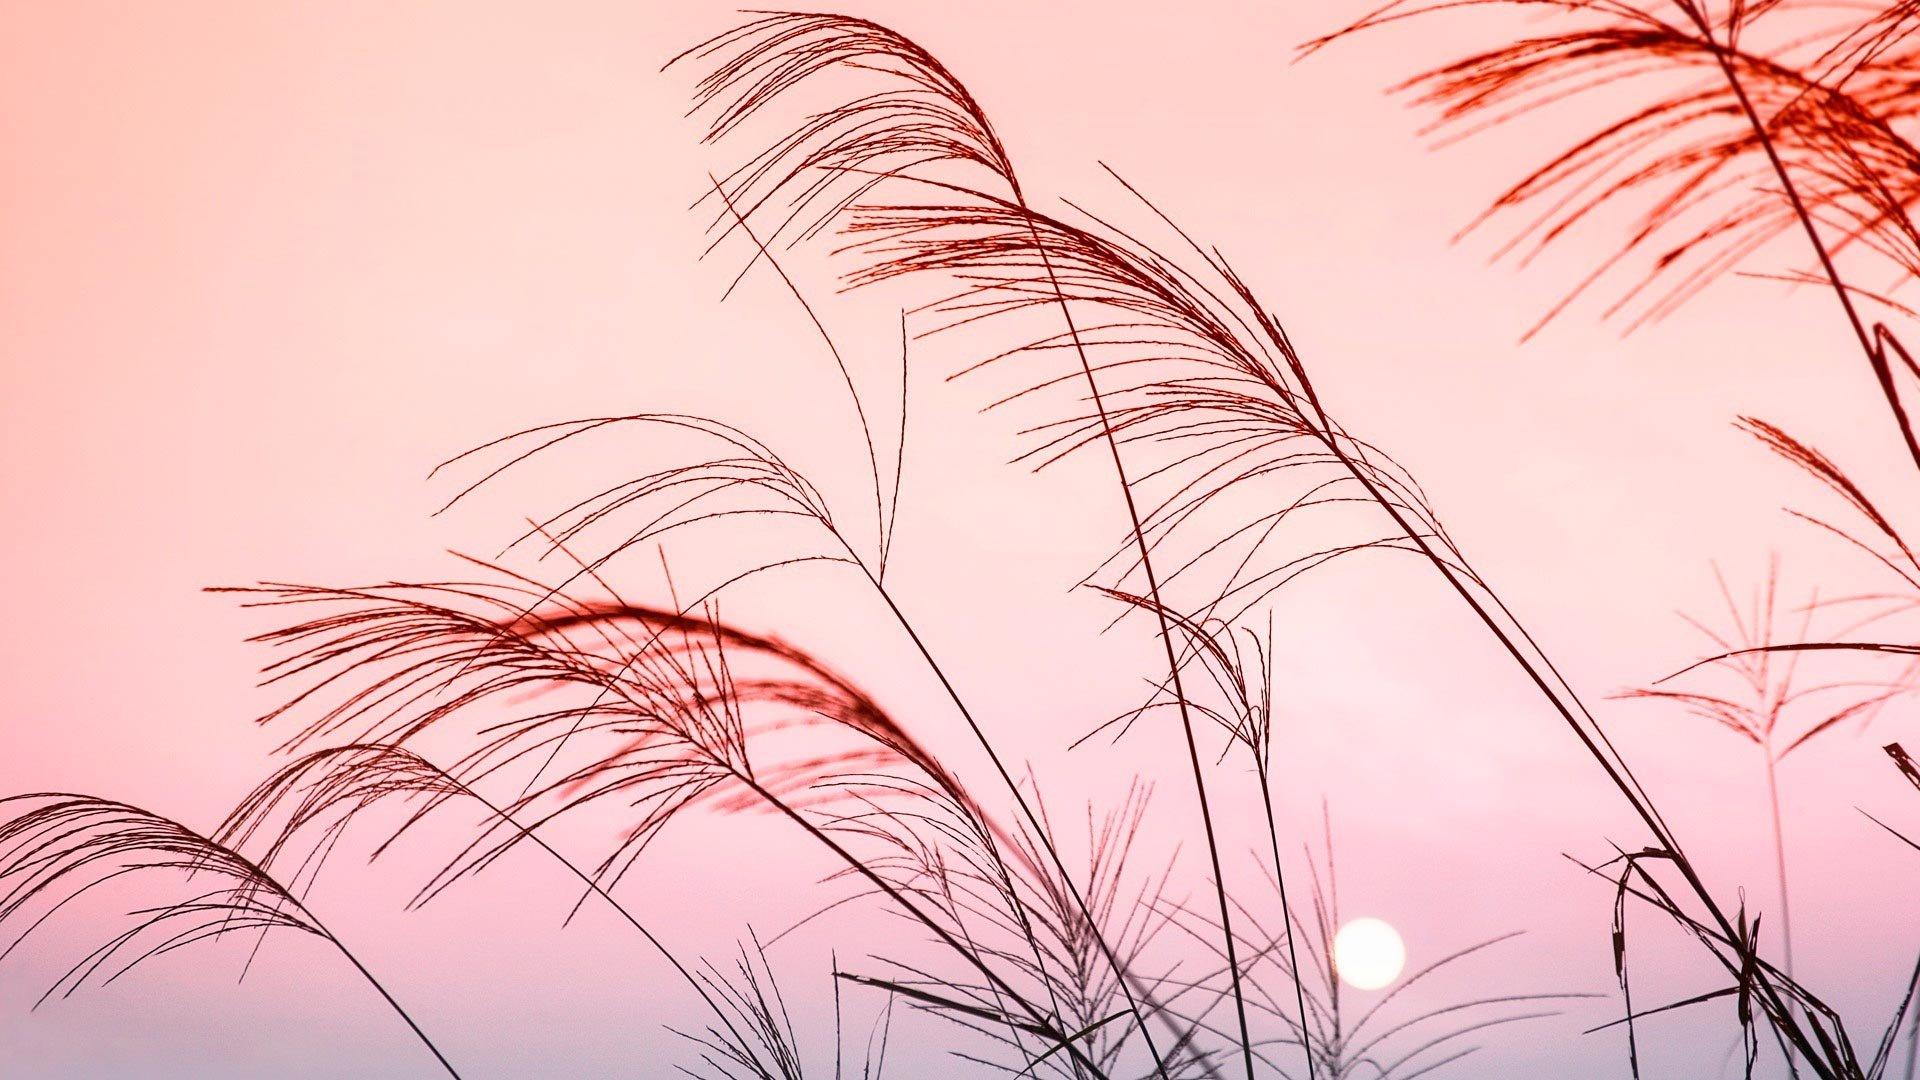 Pastel Aesthetic Wallpaper Full HD